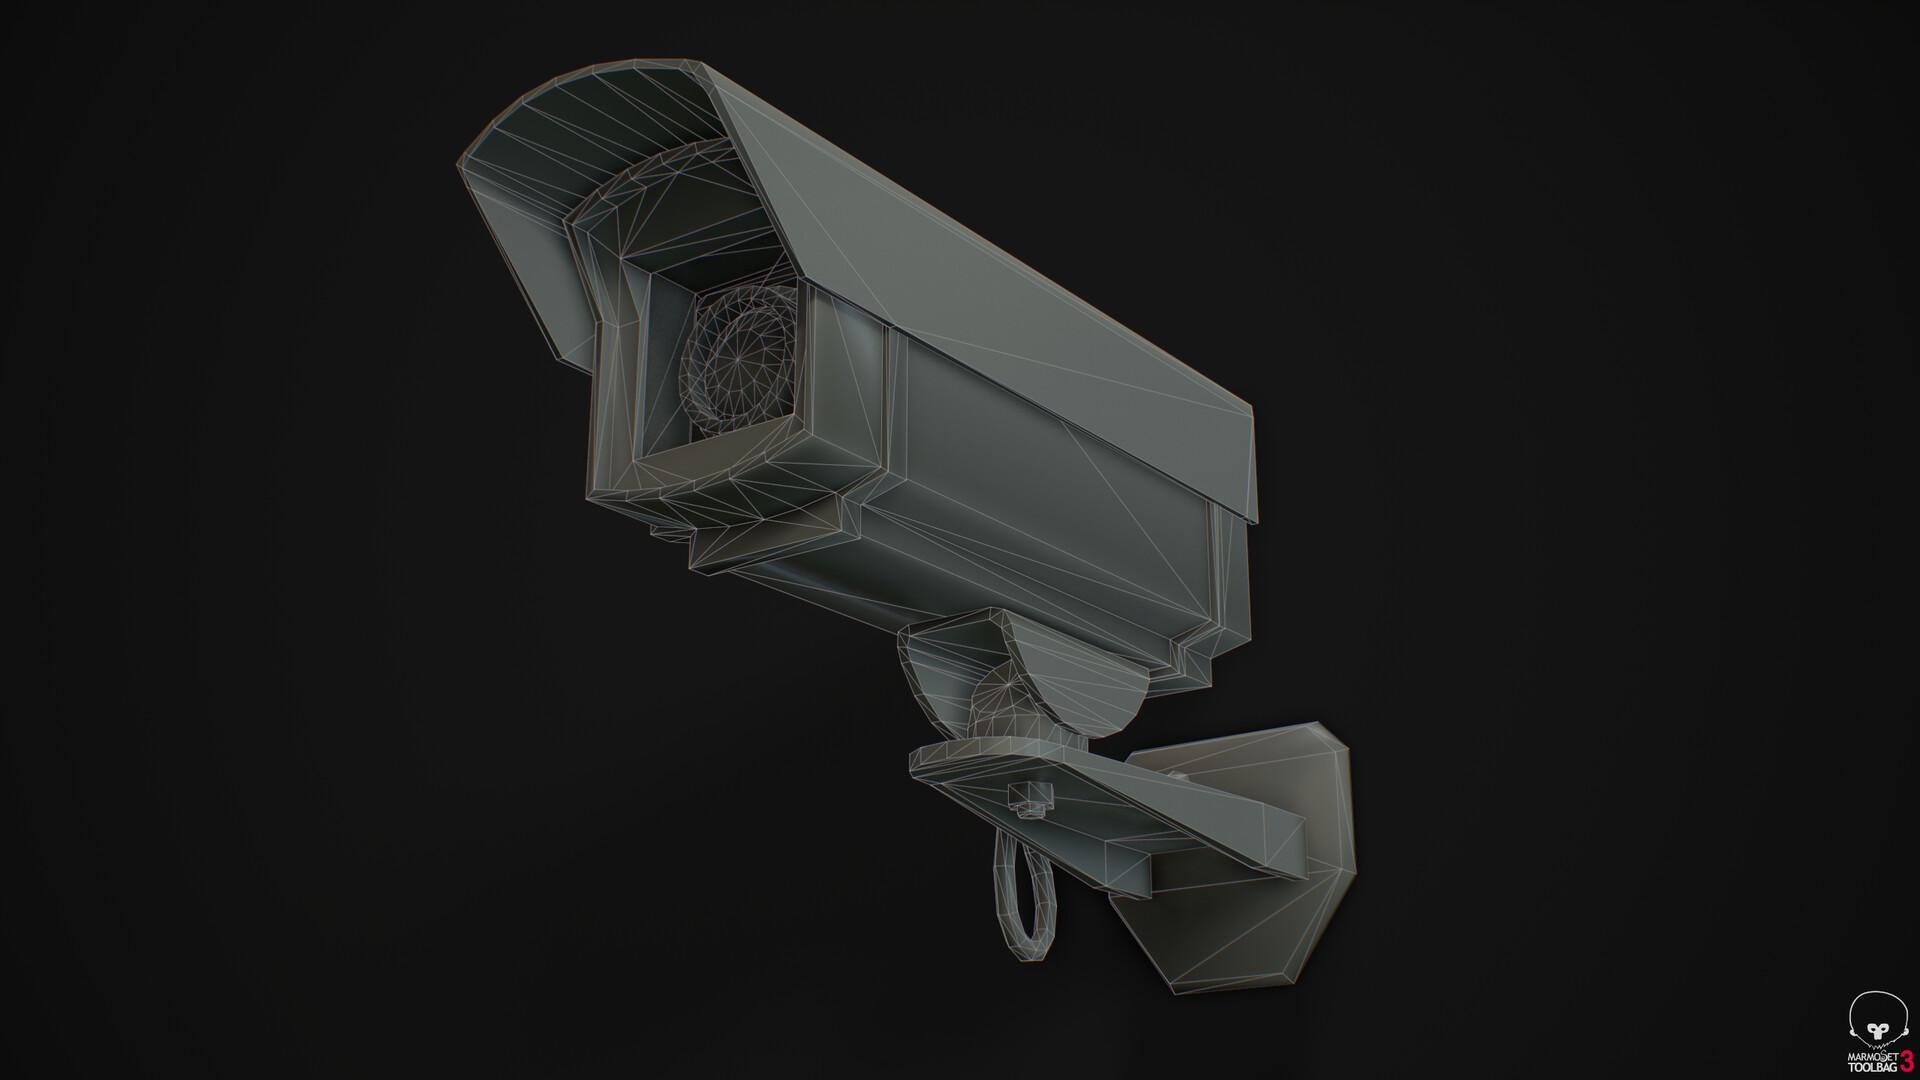 Camera B - Wireframe